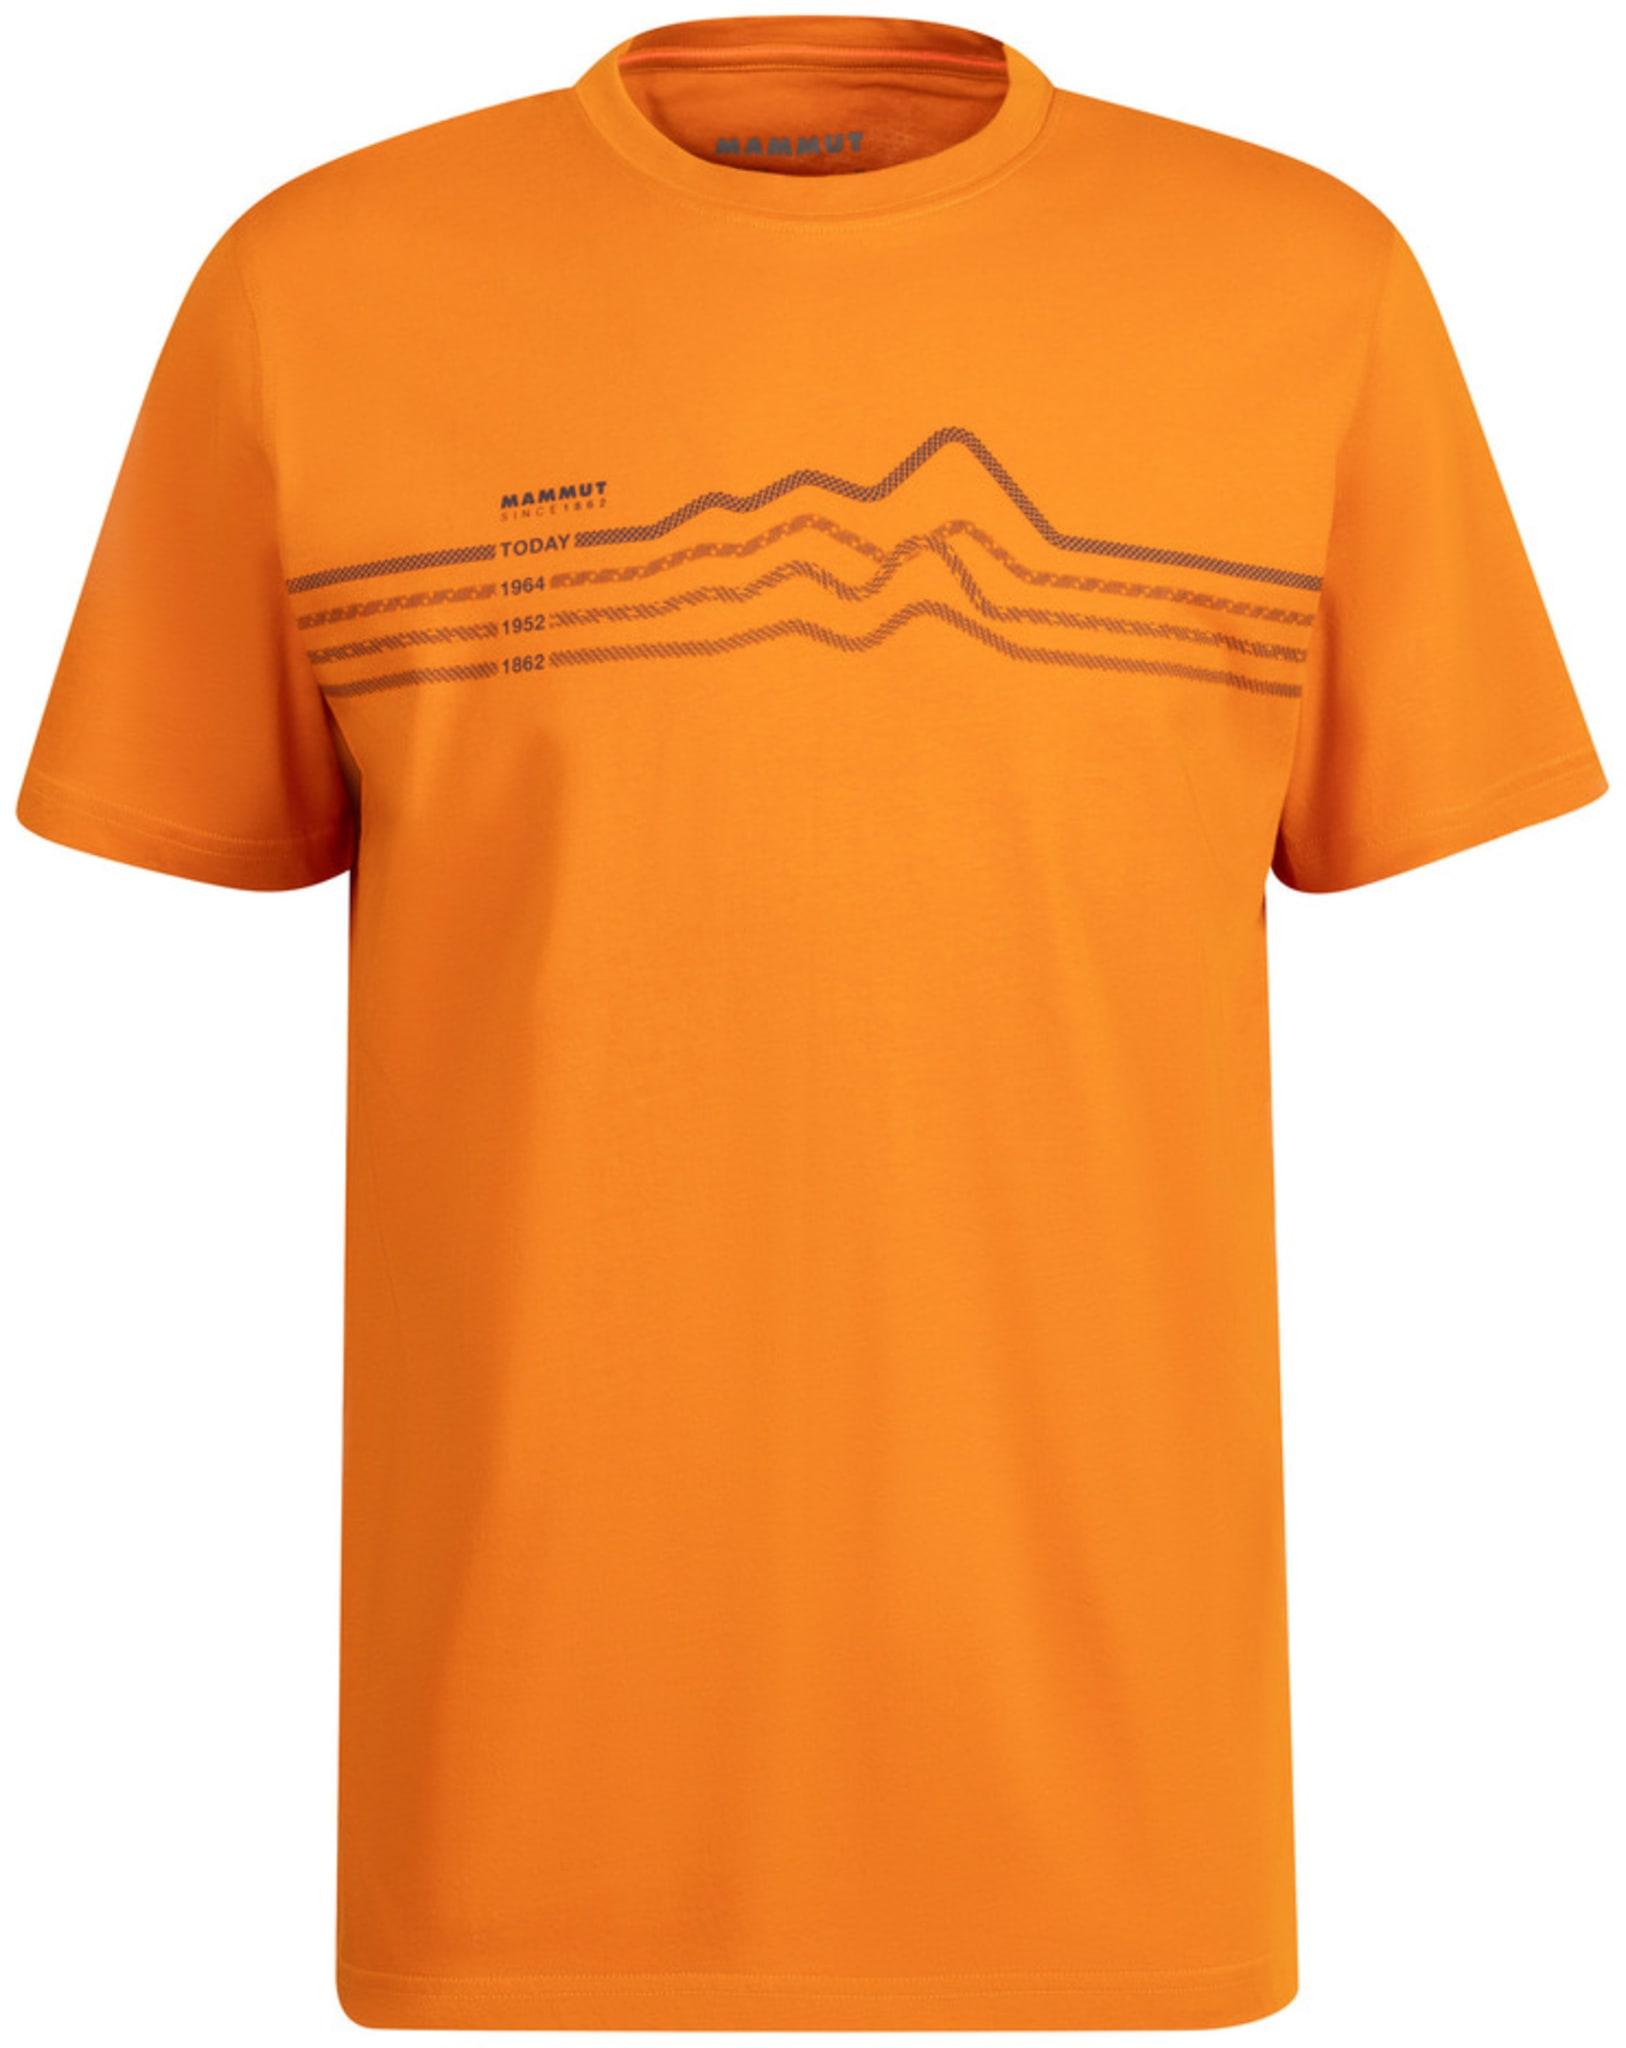 Seile T-Shirt Ms